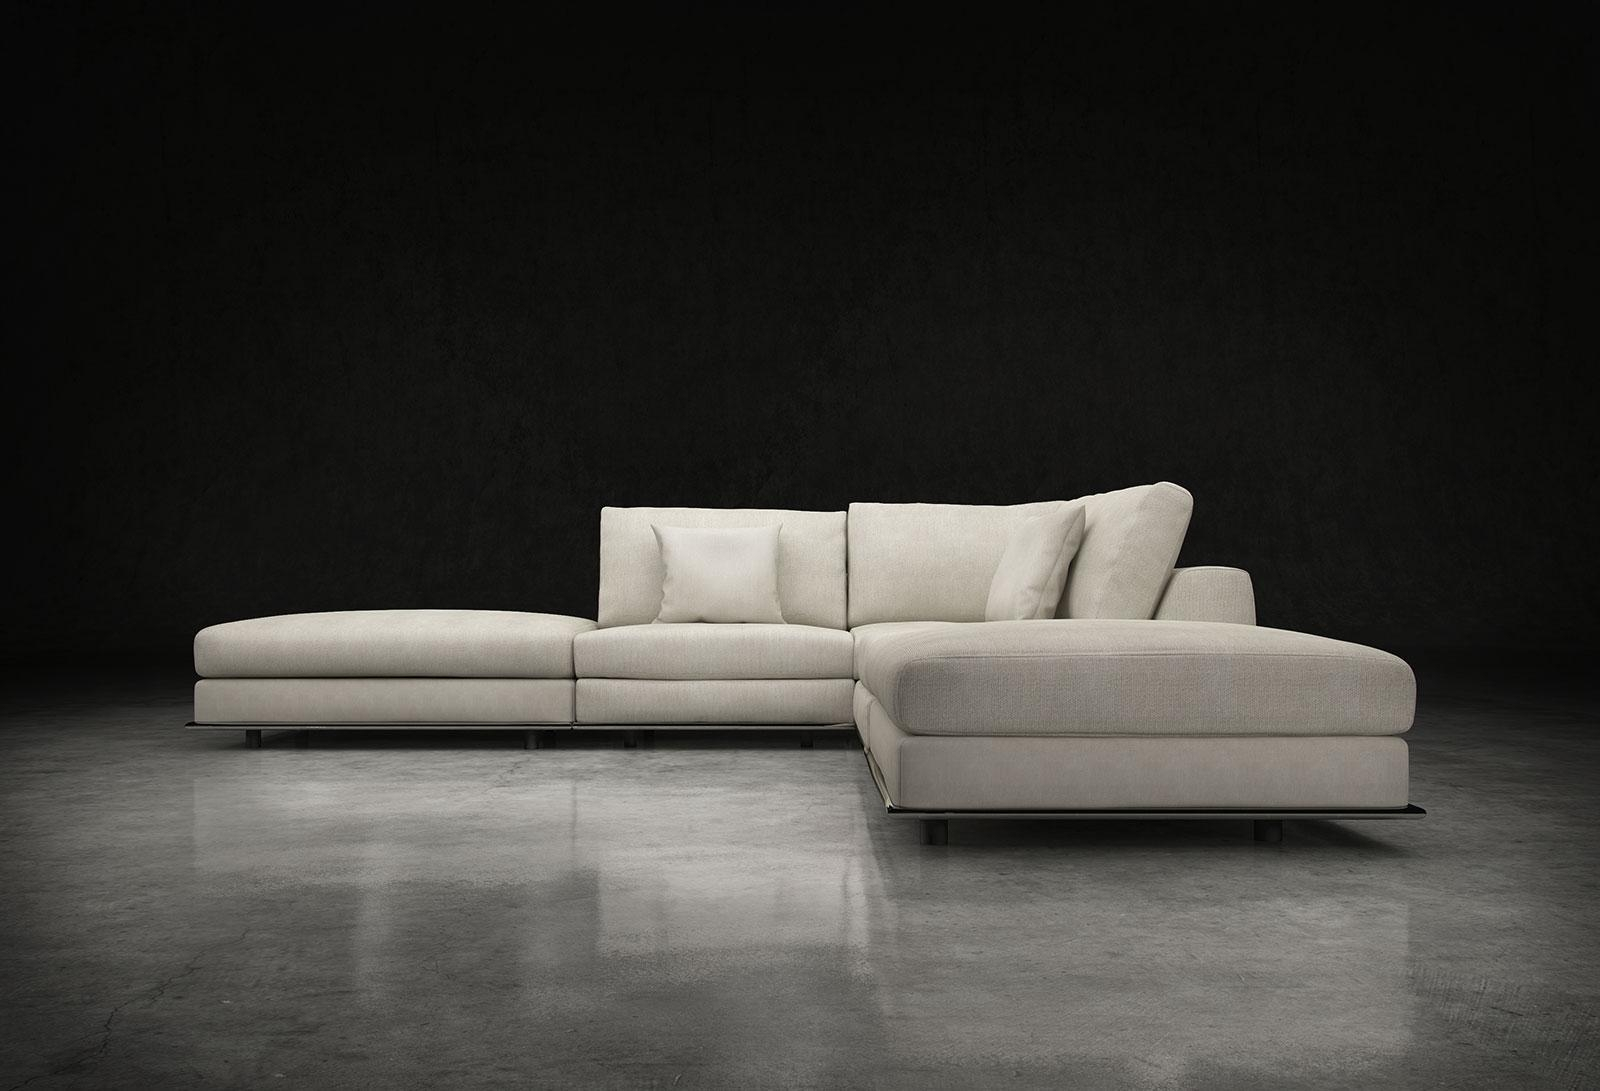 Modloft Perry Armless Corner Sofa Md820 Set04 Official Store Throughout Armless Sectional Sofas (View 6 of 15)